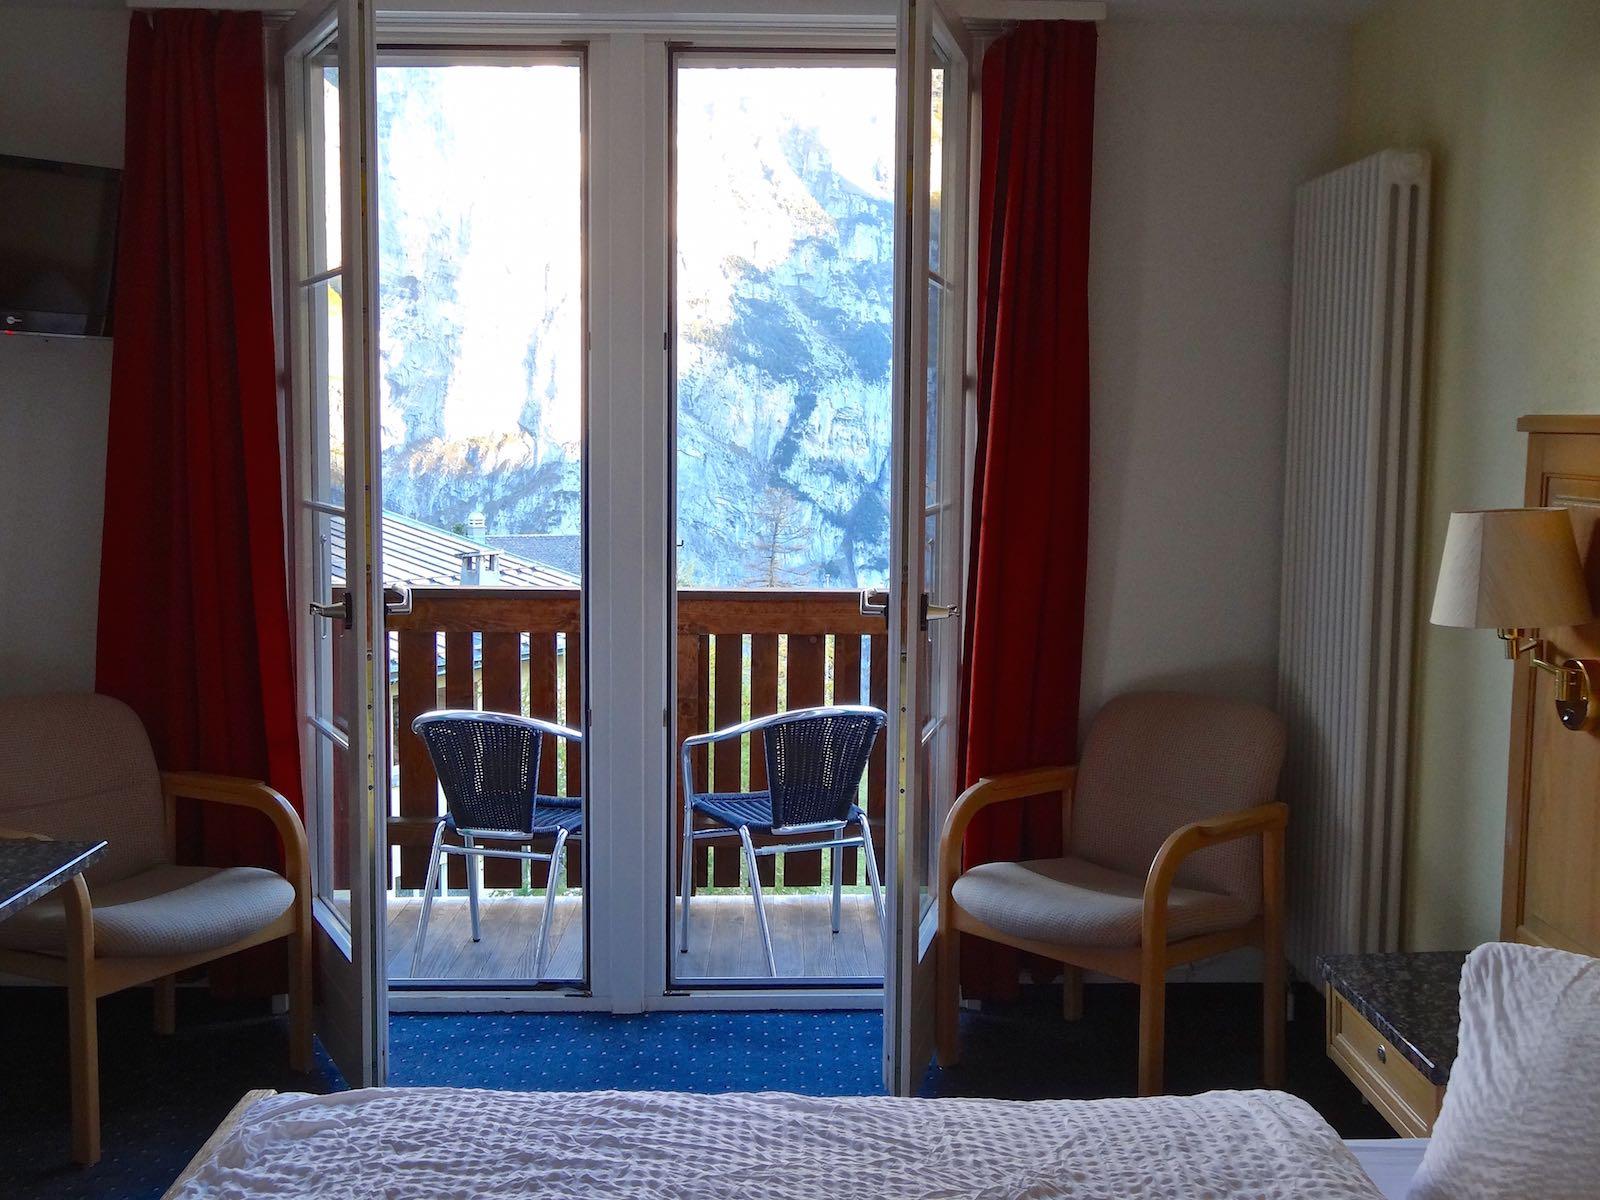 http://hoteljungfrau.ch/wp-content/uploads/2014/11/superior-zimmer-12.jpg